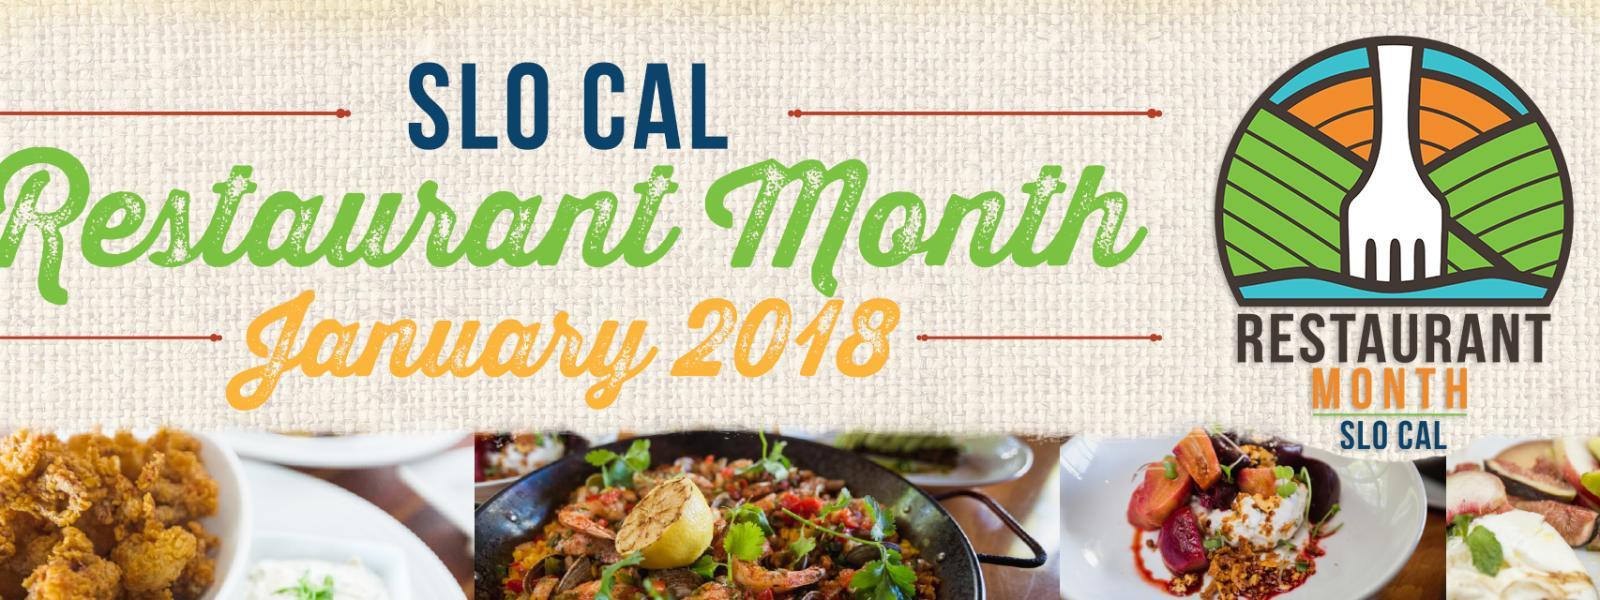 SLO CAL Restaurant Month